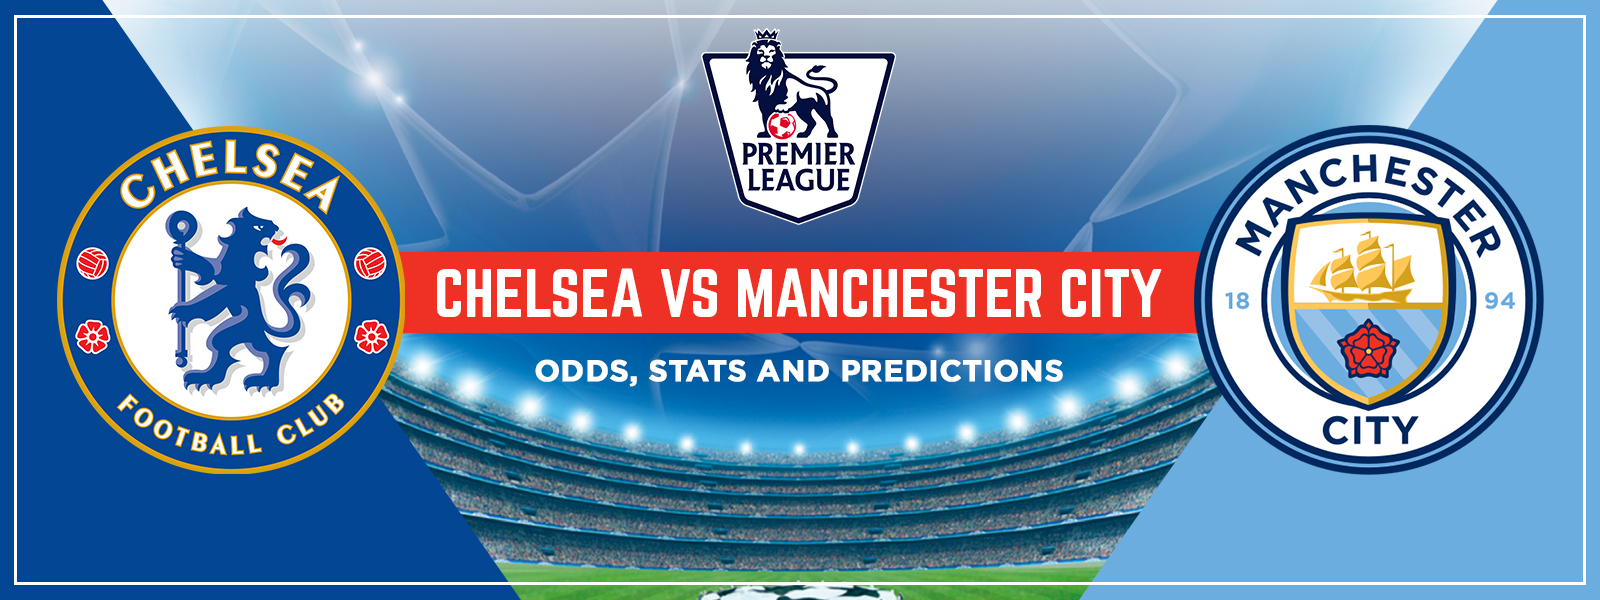 Chelsea vs Manchester City Expert Match Analysis & Odds